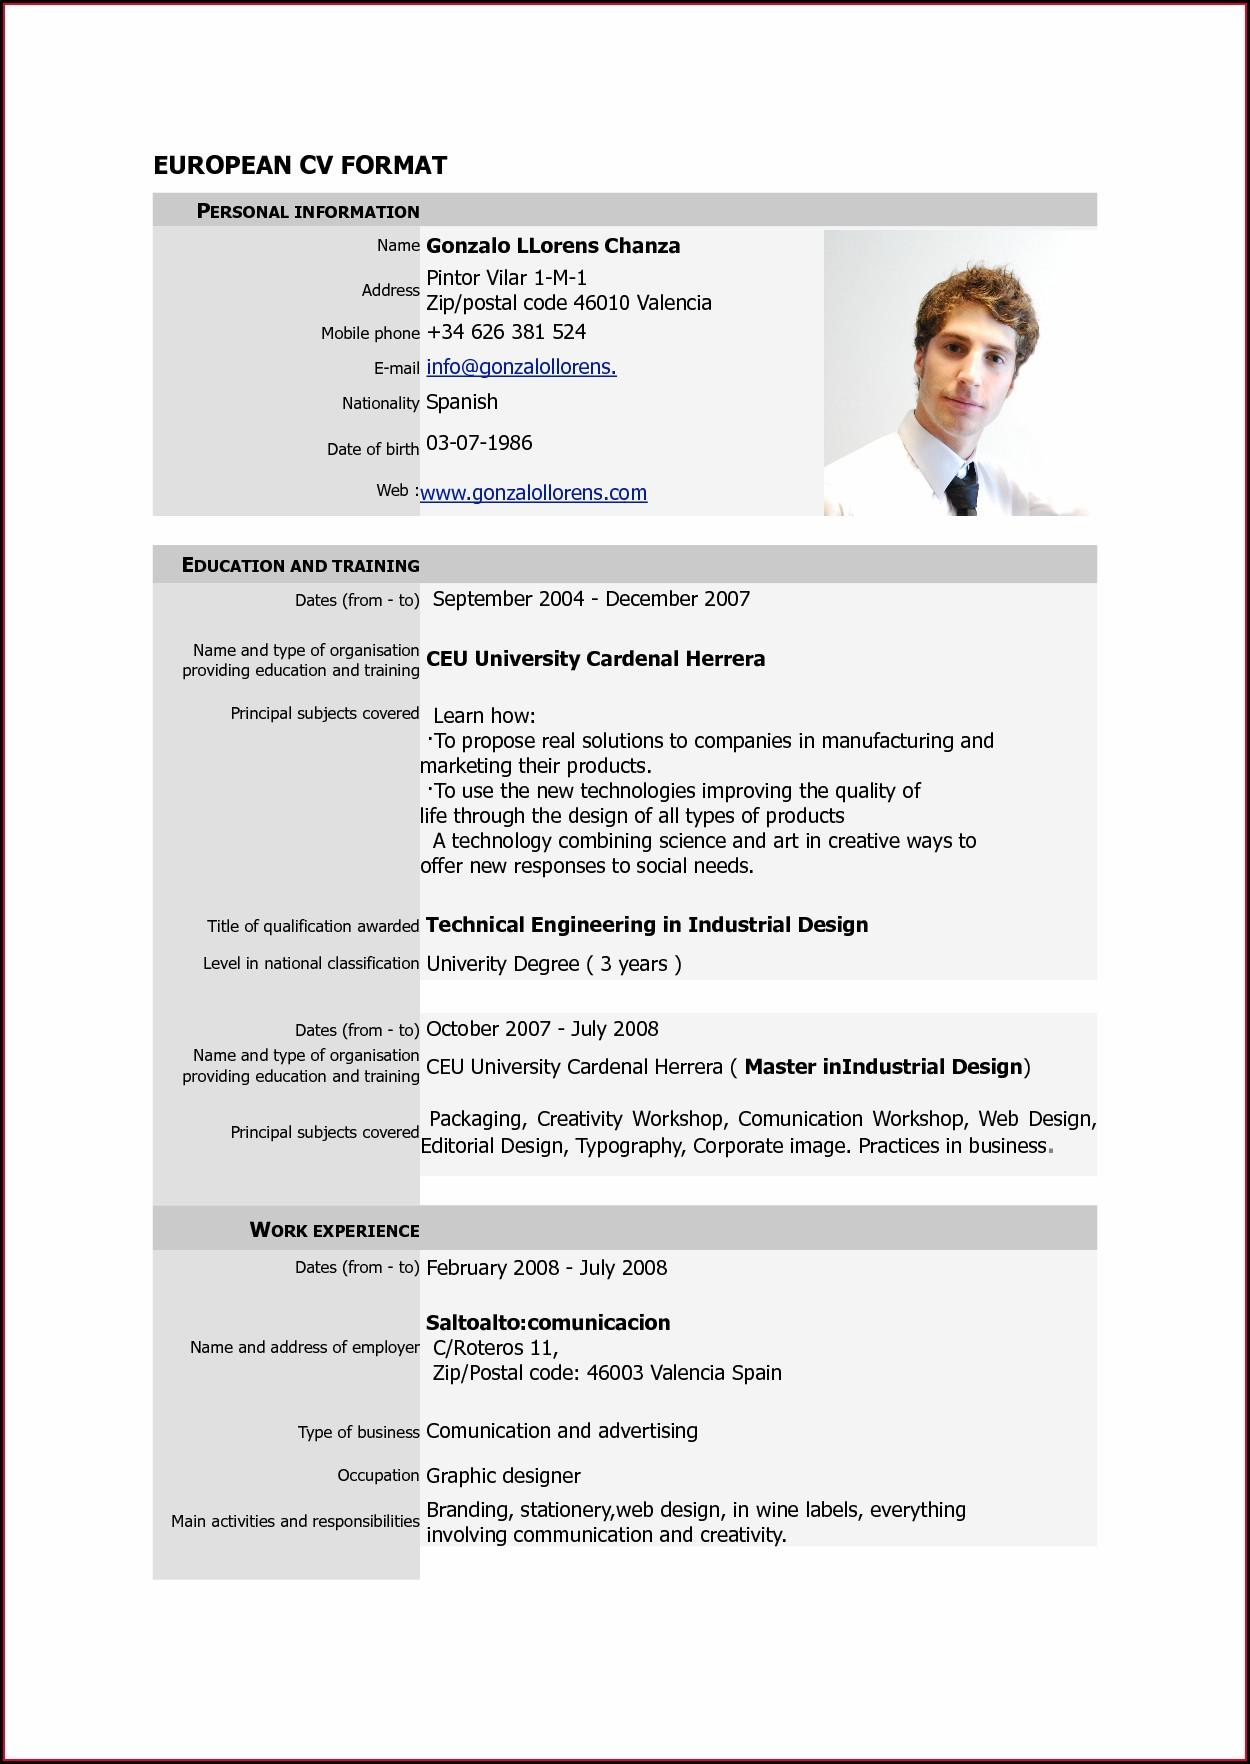 Job Application Pdf Curriculum Vitae Format Pdf Free Download